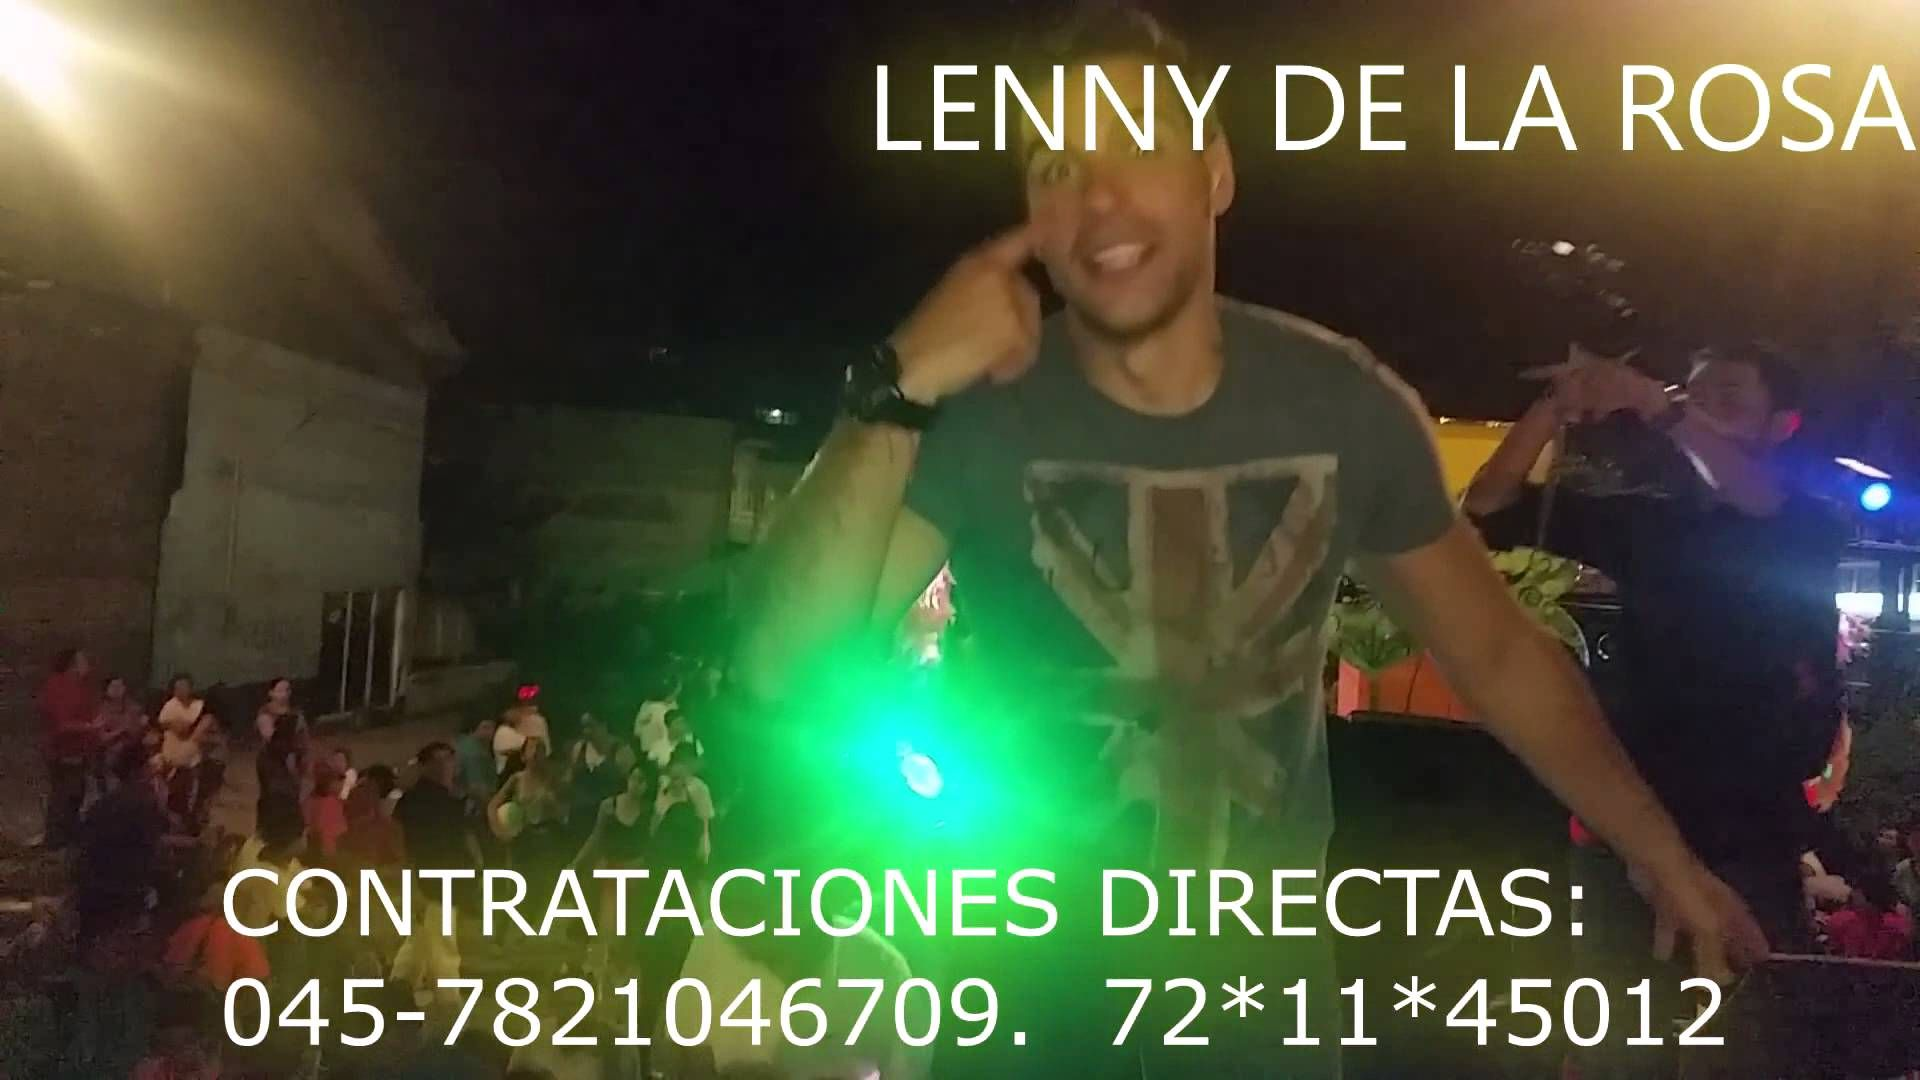 LENNY DE LA ROSA  CONTRATACIONES DIRECTAS:  5561822411. 045-7821046709.